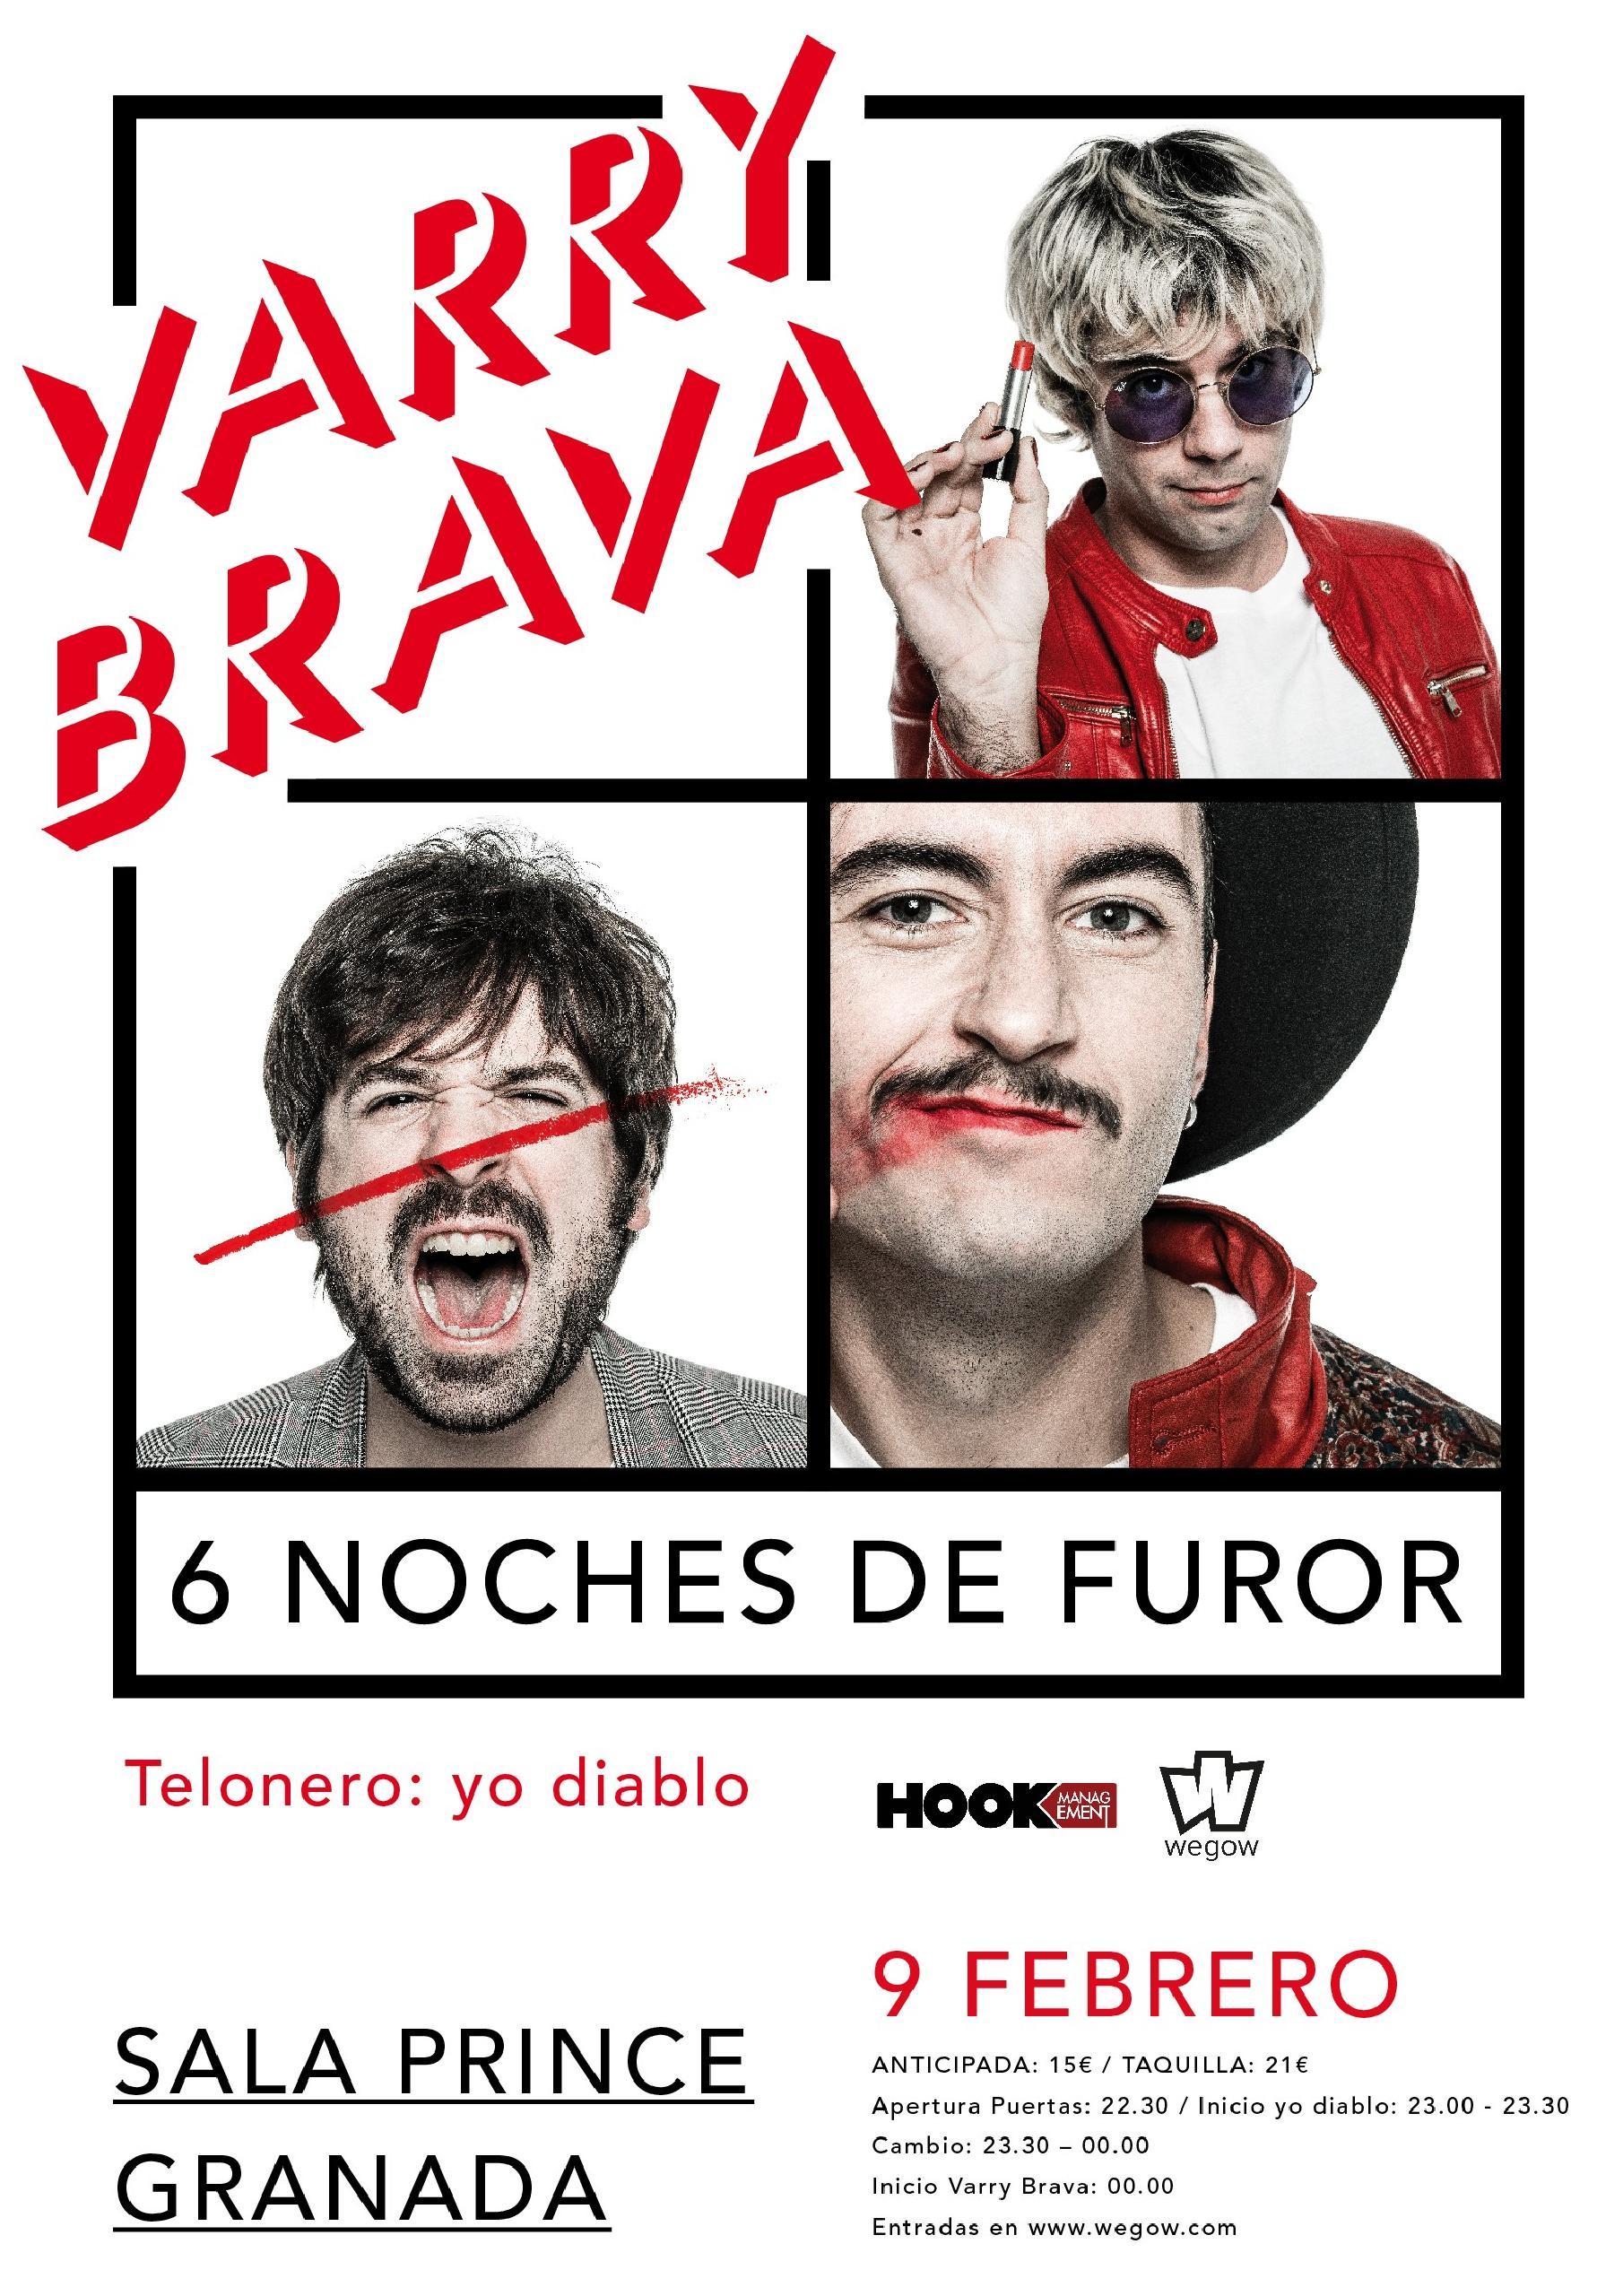 Varry Brava en Sala Prince Granada